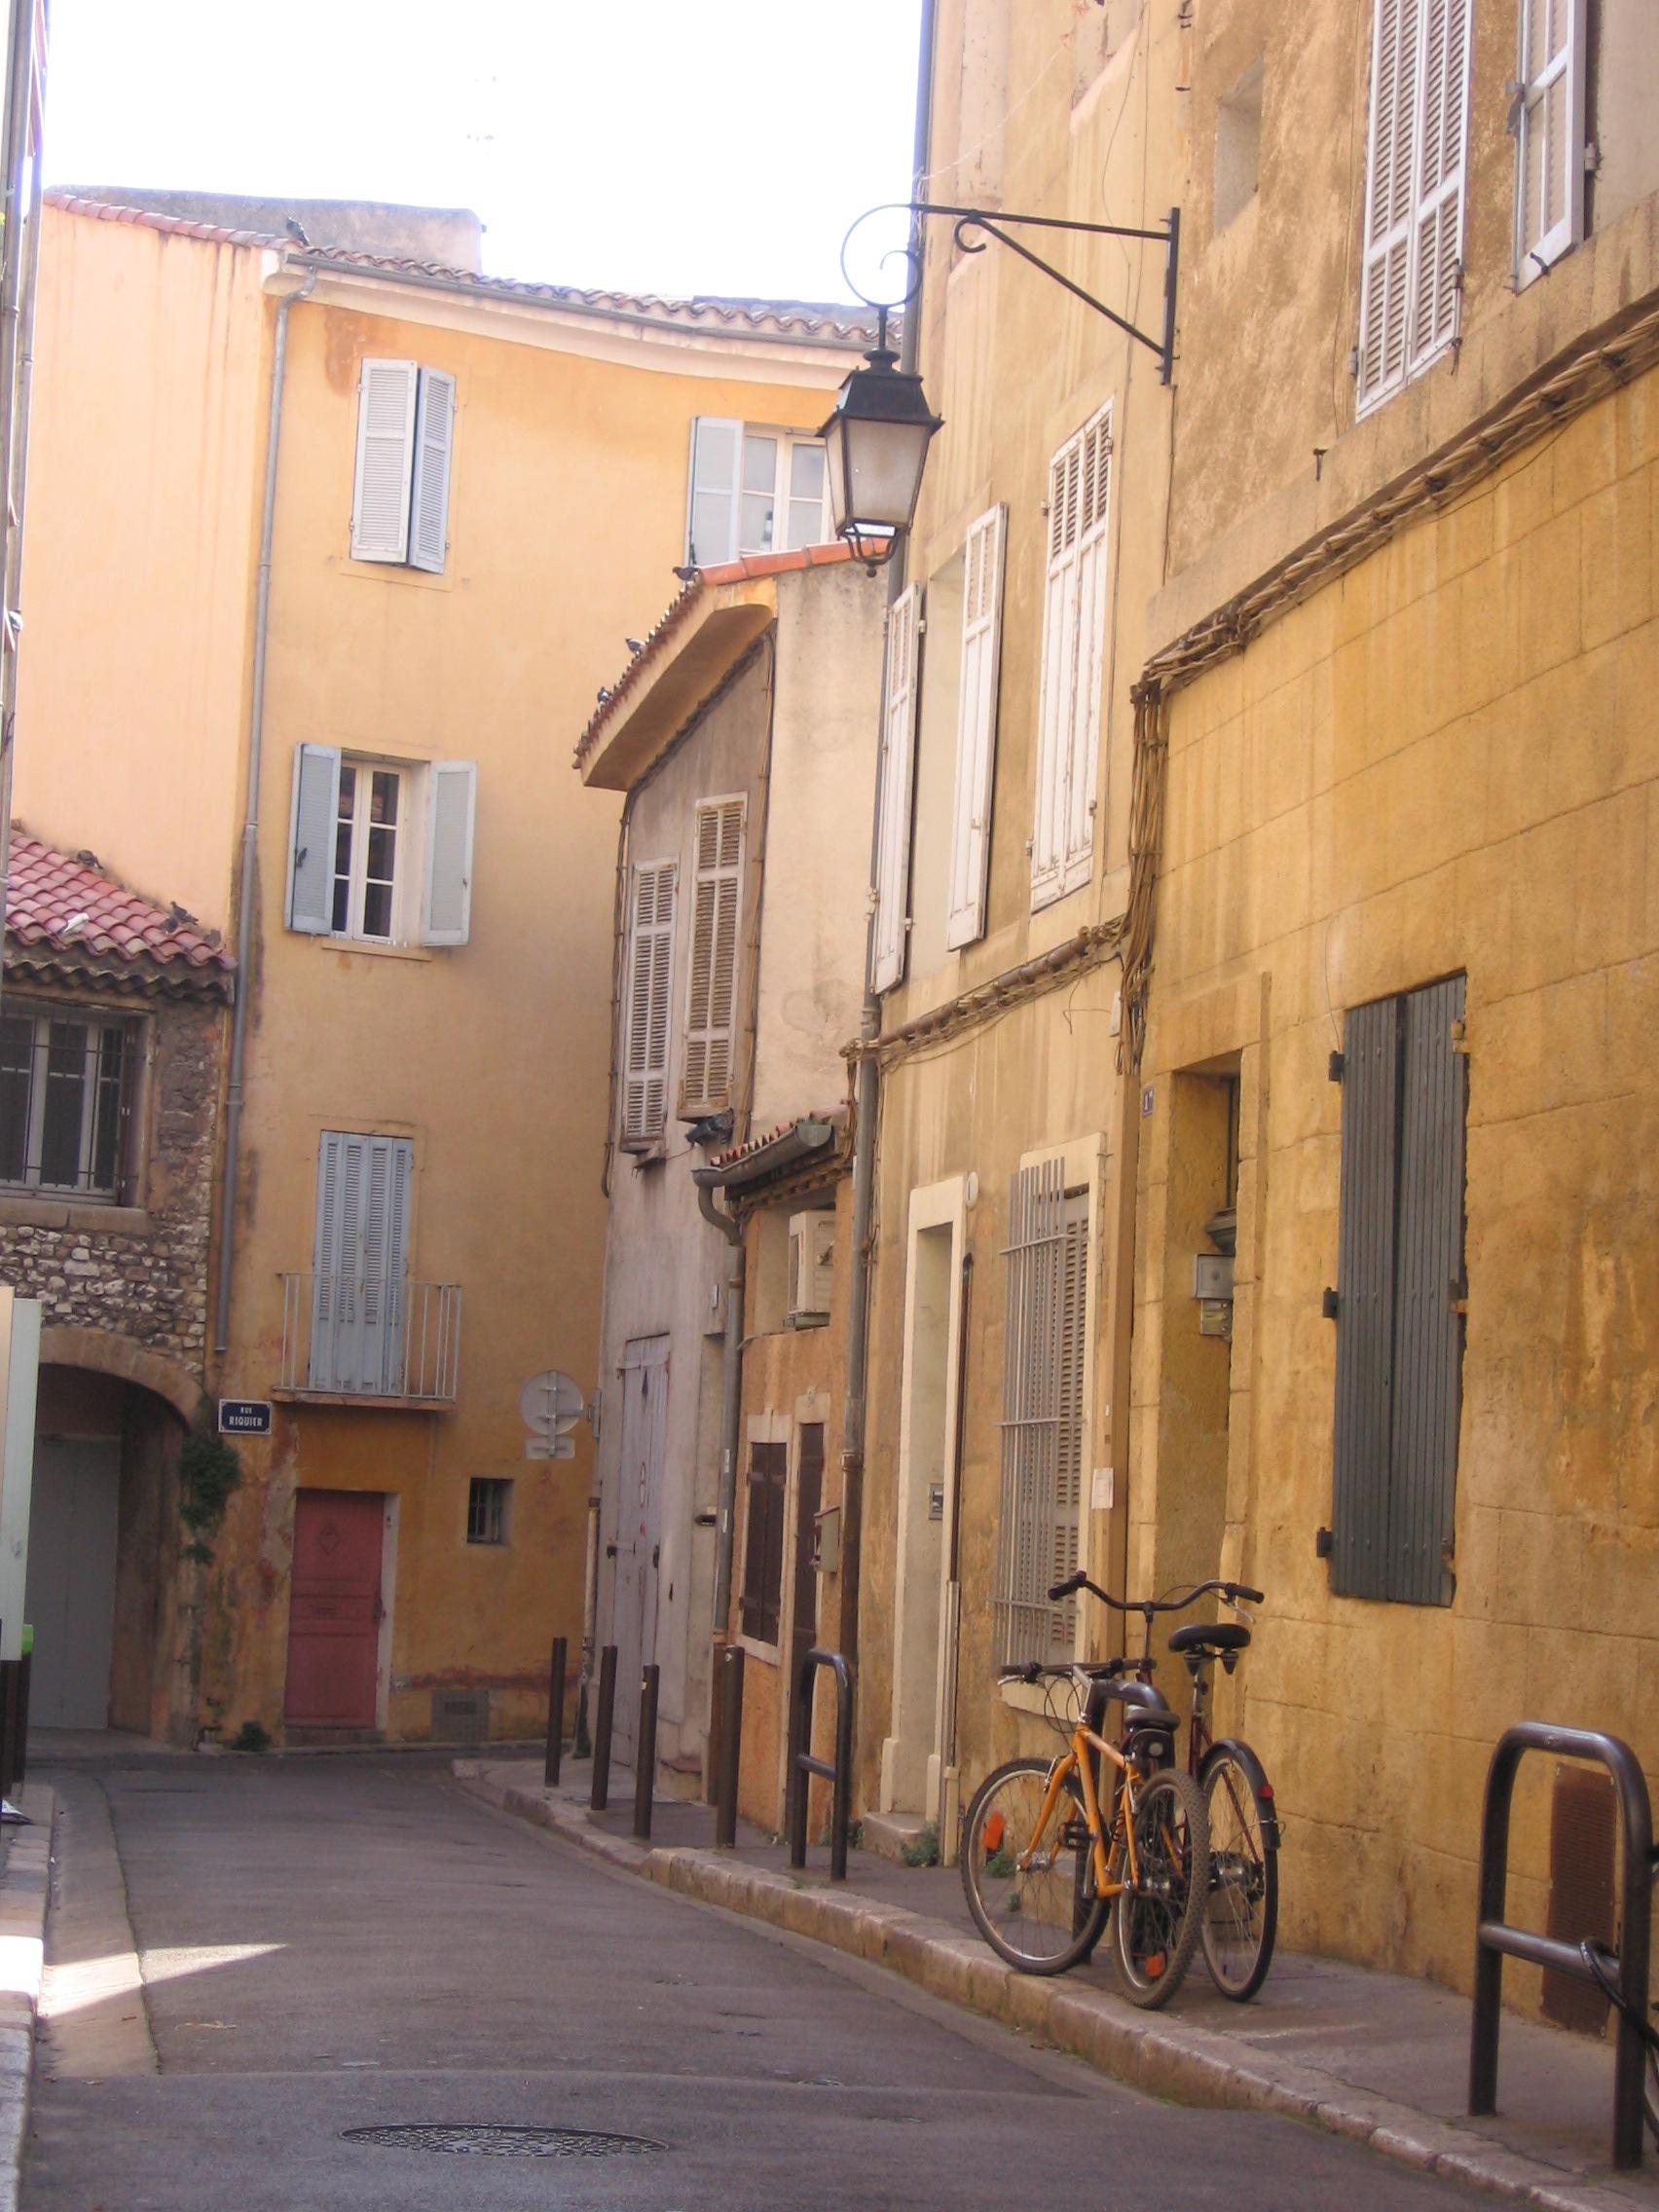 Paula Cullison - Aix-in-ProvenceFrancebicycleIMG_0768.JPG